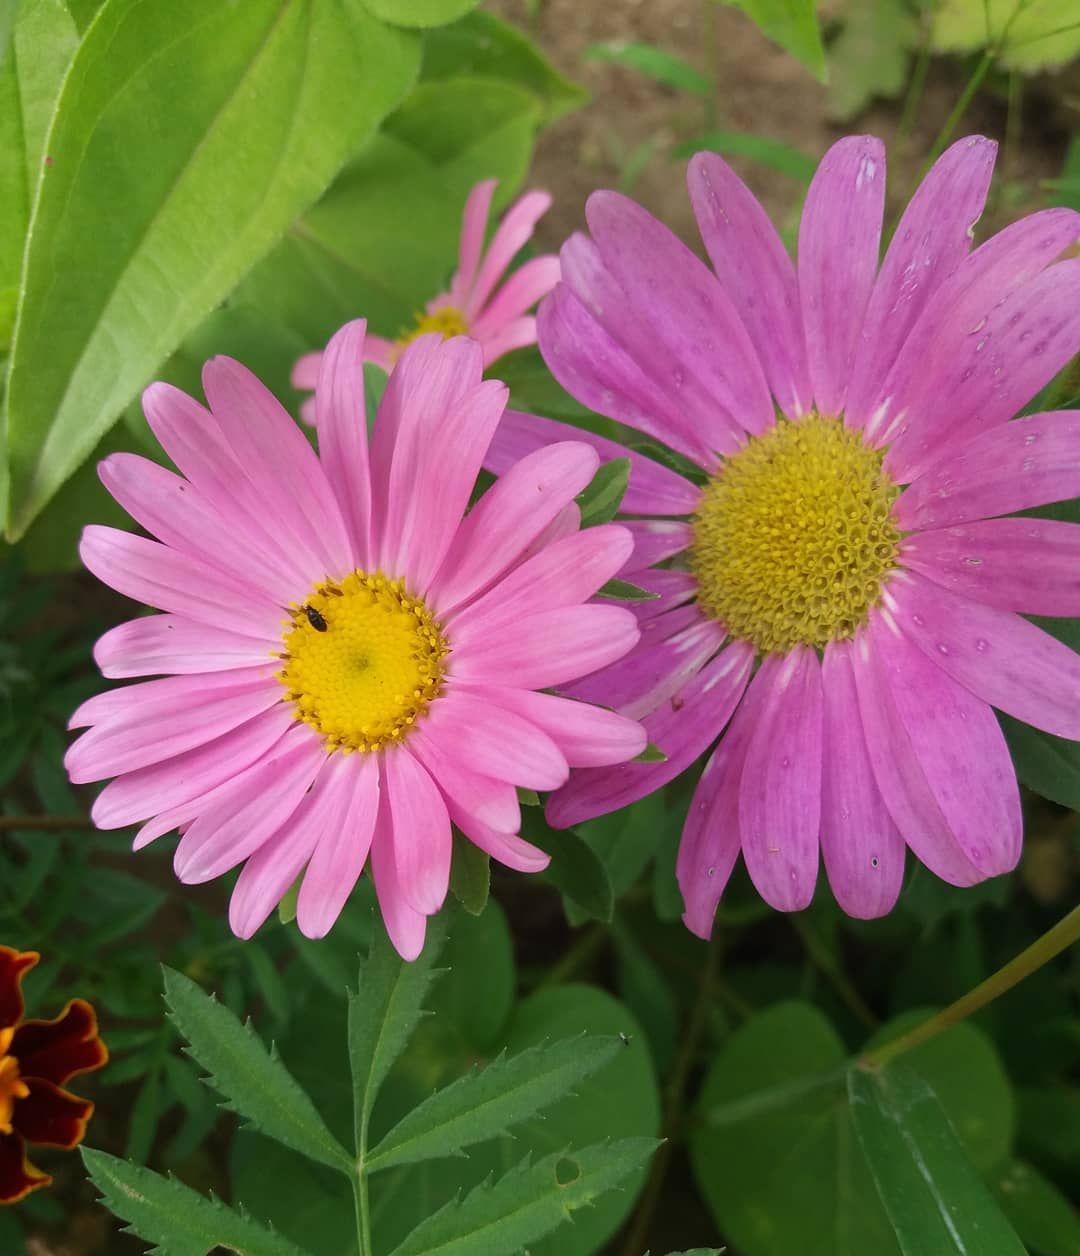 Rosa Gaensebluemchen Samen